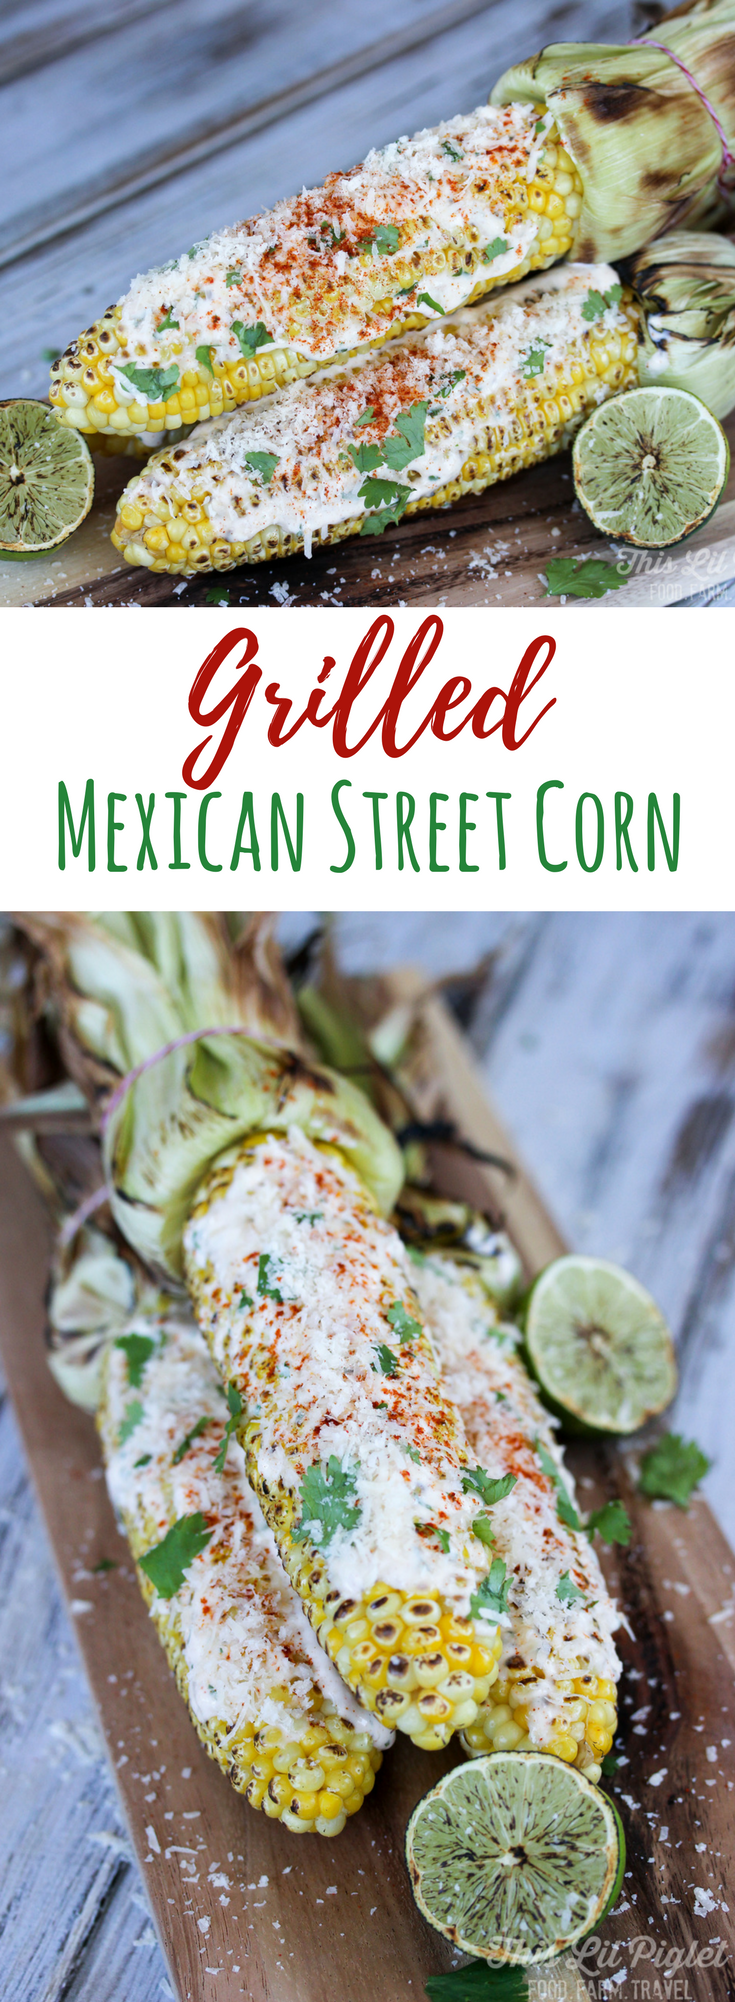 Grilled Mexican Street Corn Cinco de Mayo // thislilpiglet.net